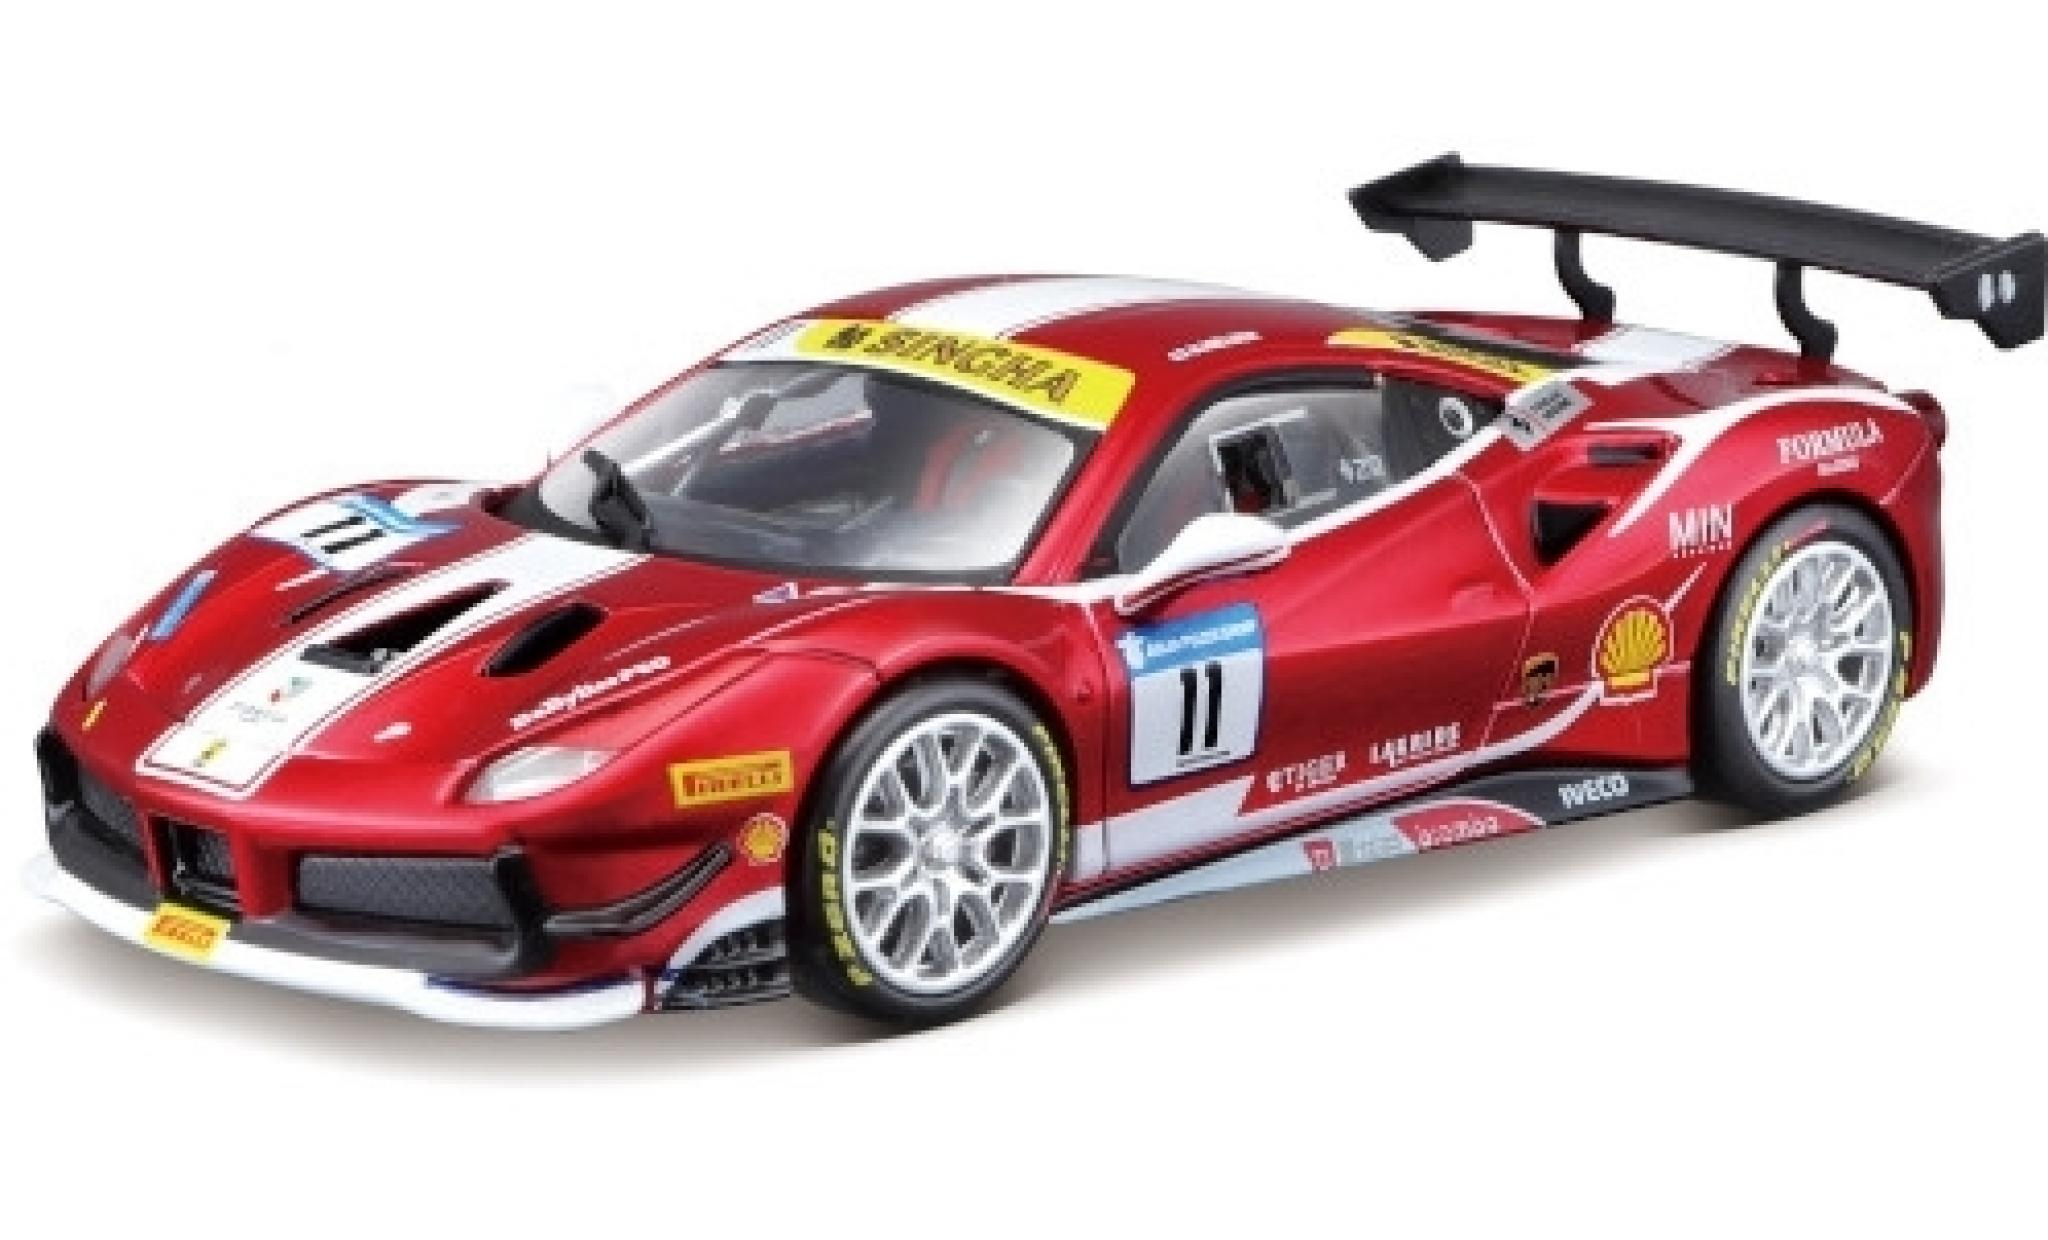 Ferrari 488 1/24 Bburago Challenge No.11 Formula Racing 2017 N.Nielsen